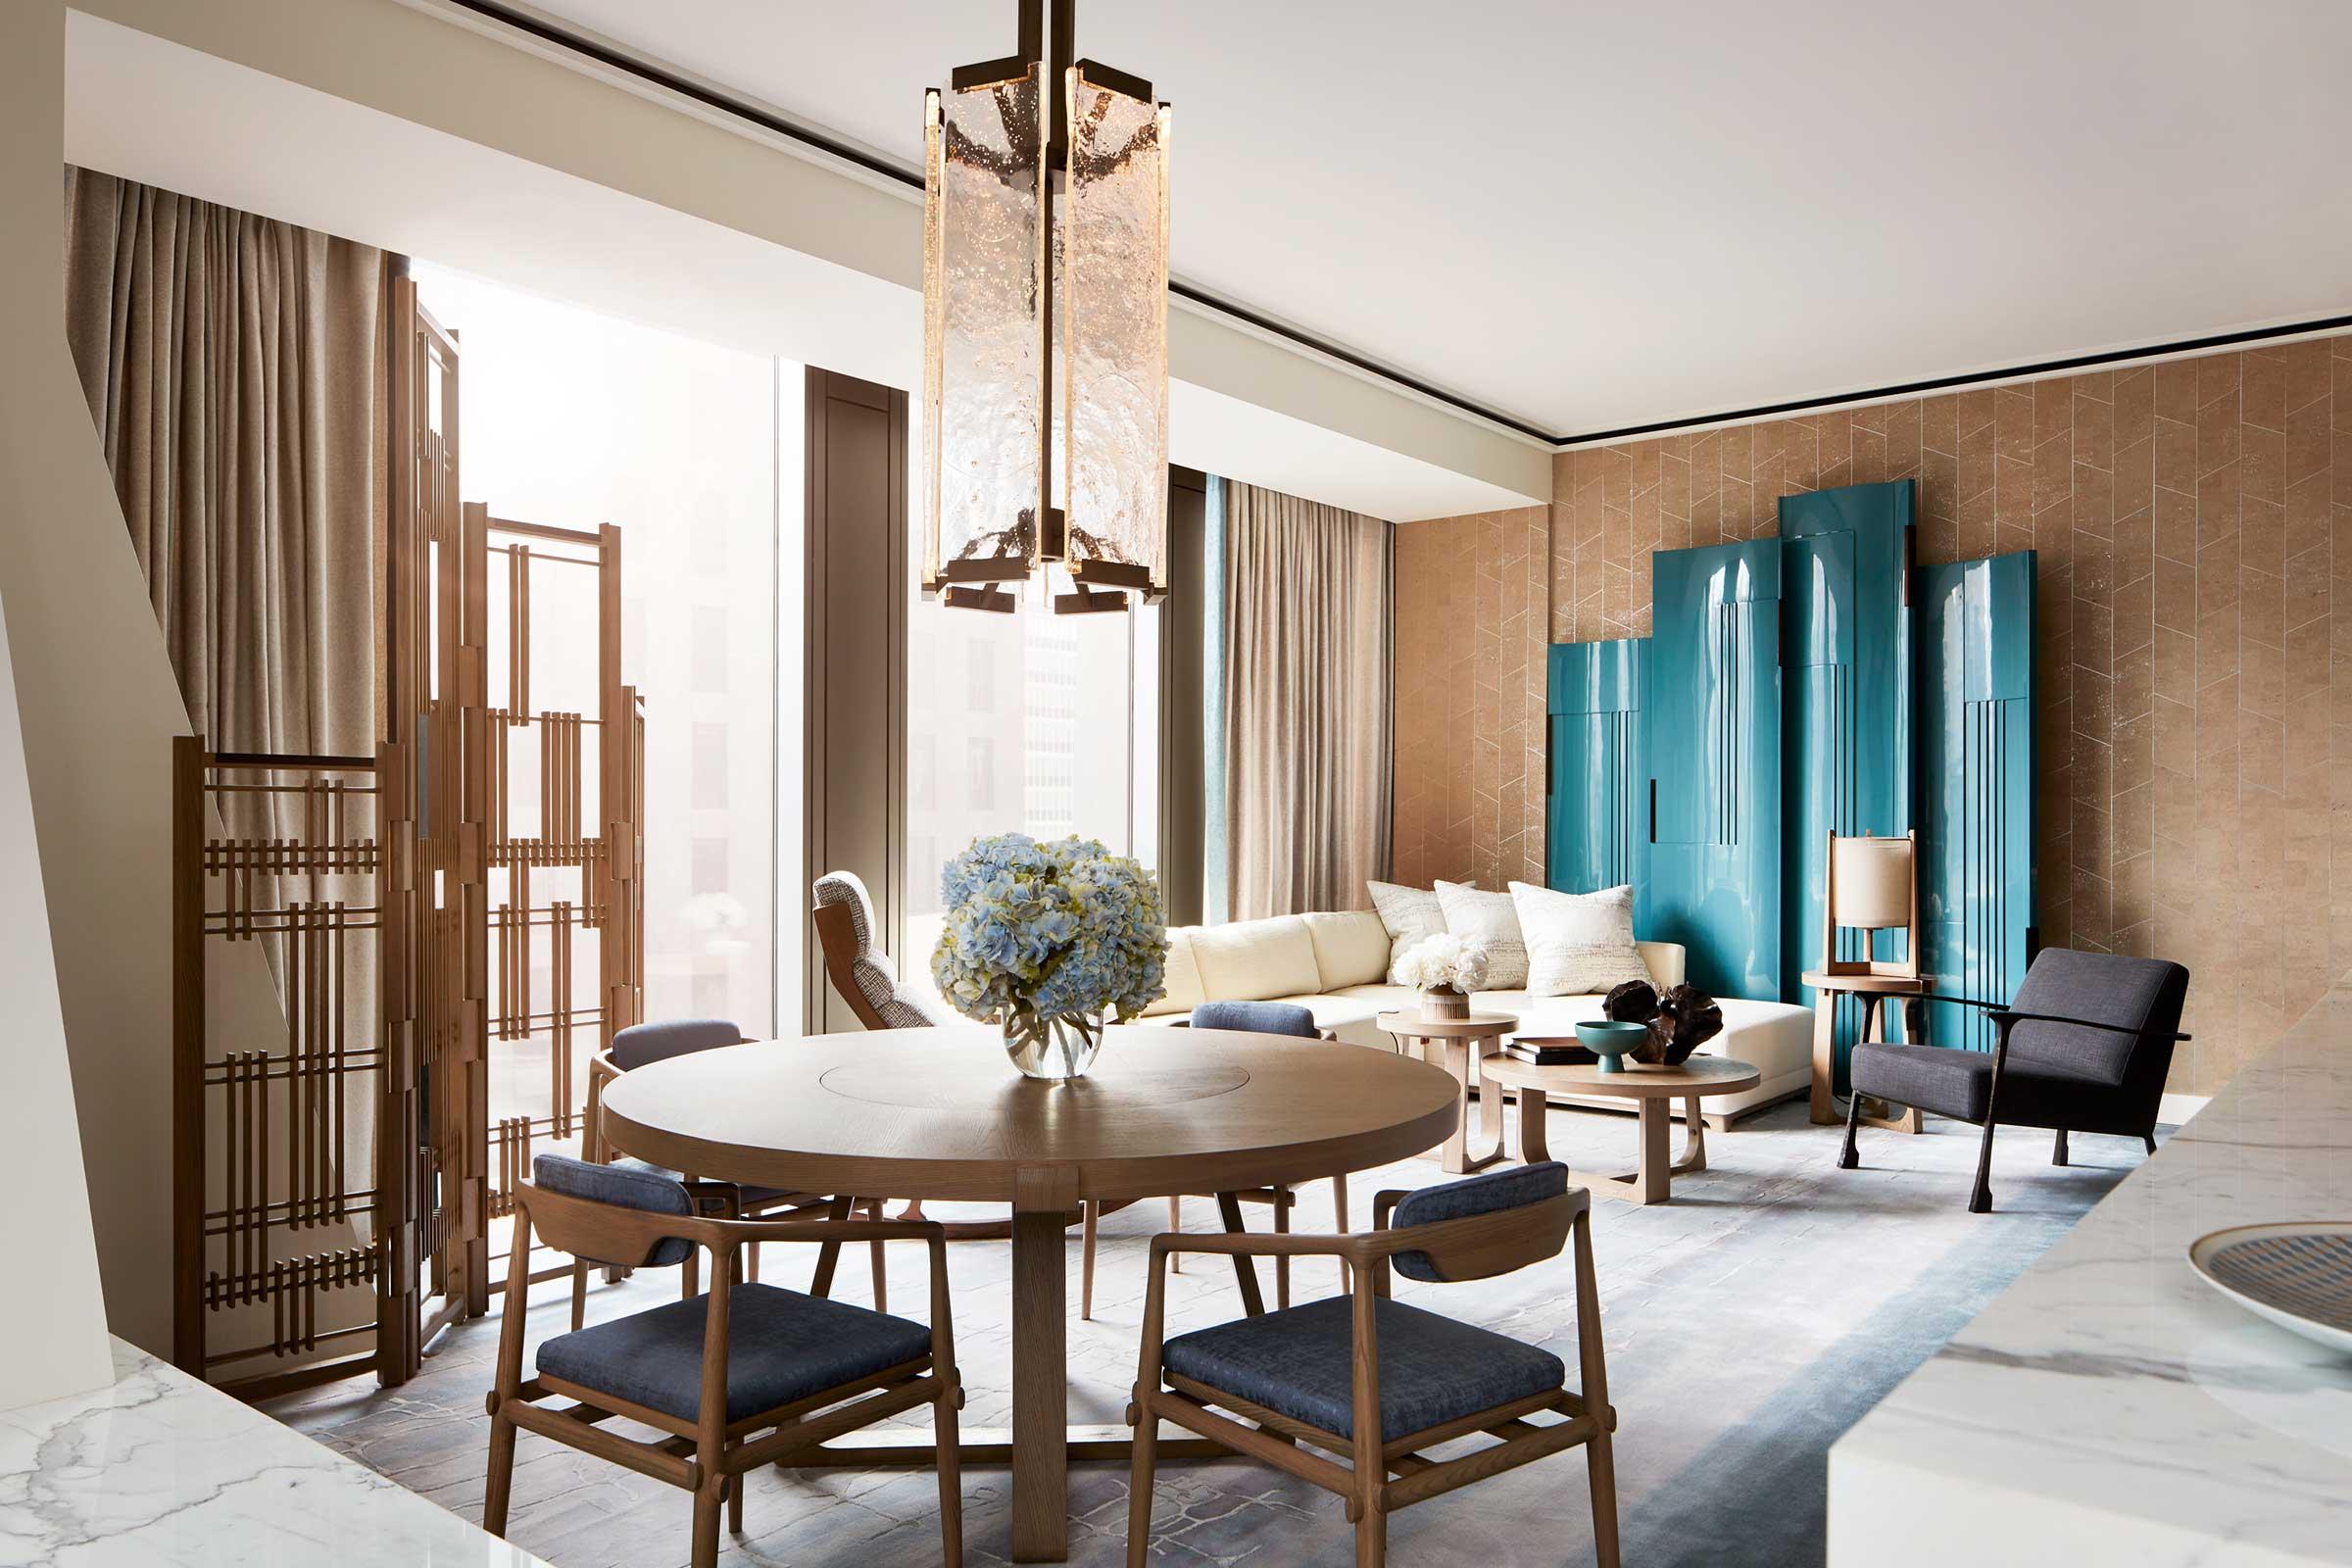 53W53-Living-Room-and-Dining-Room_credit-Stephen-Kent-Johnson.jpg